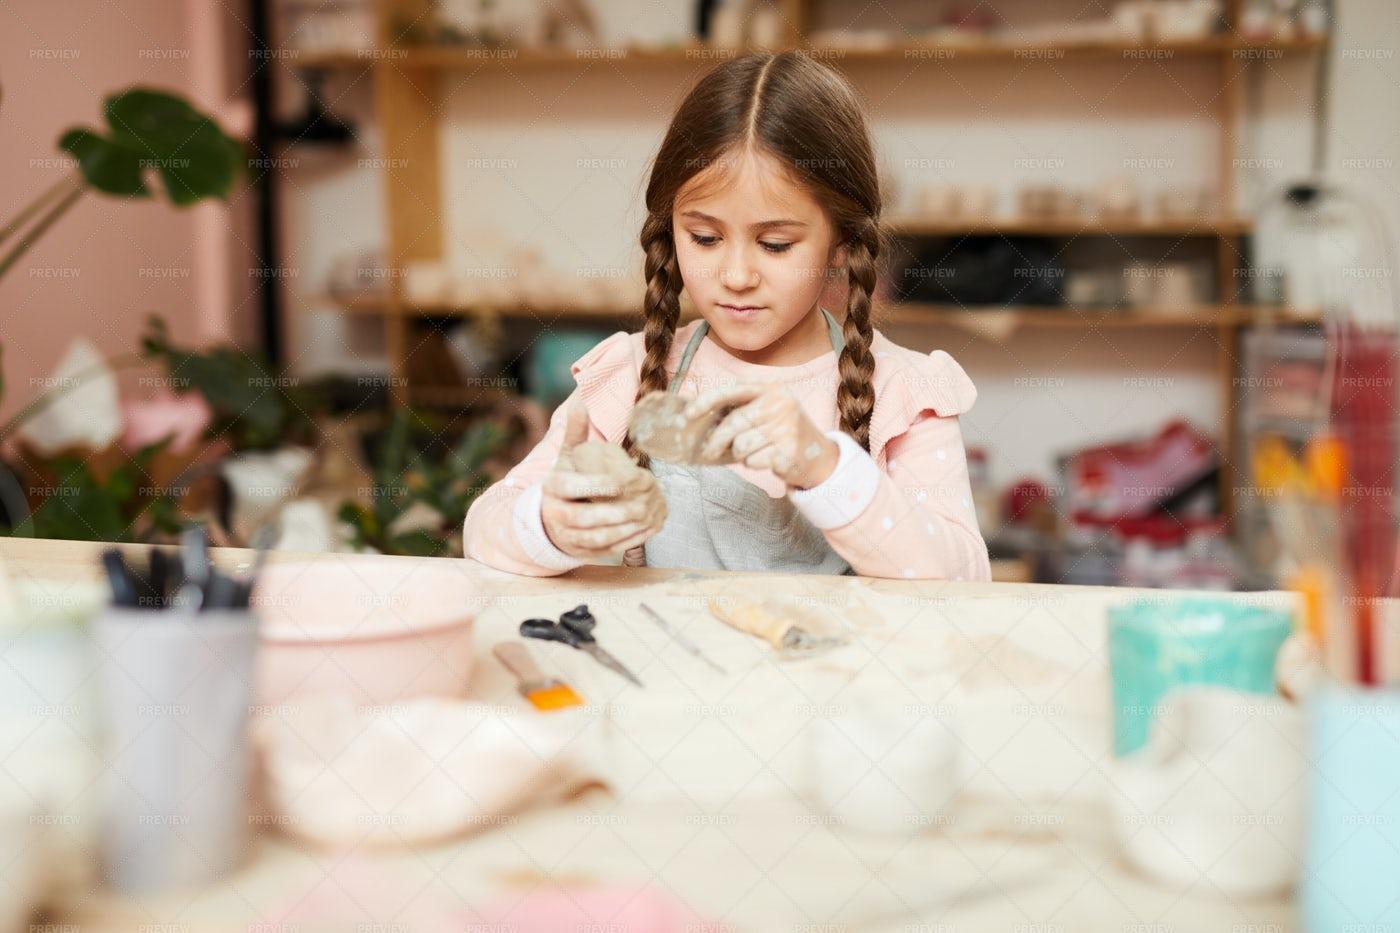 Cute Little Girl Shaping Clay: Stock Photos